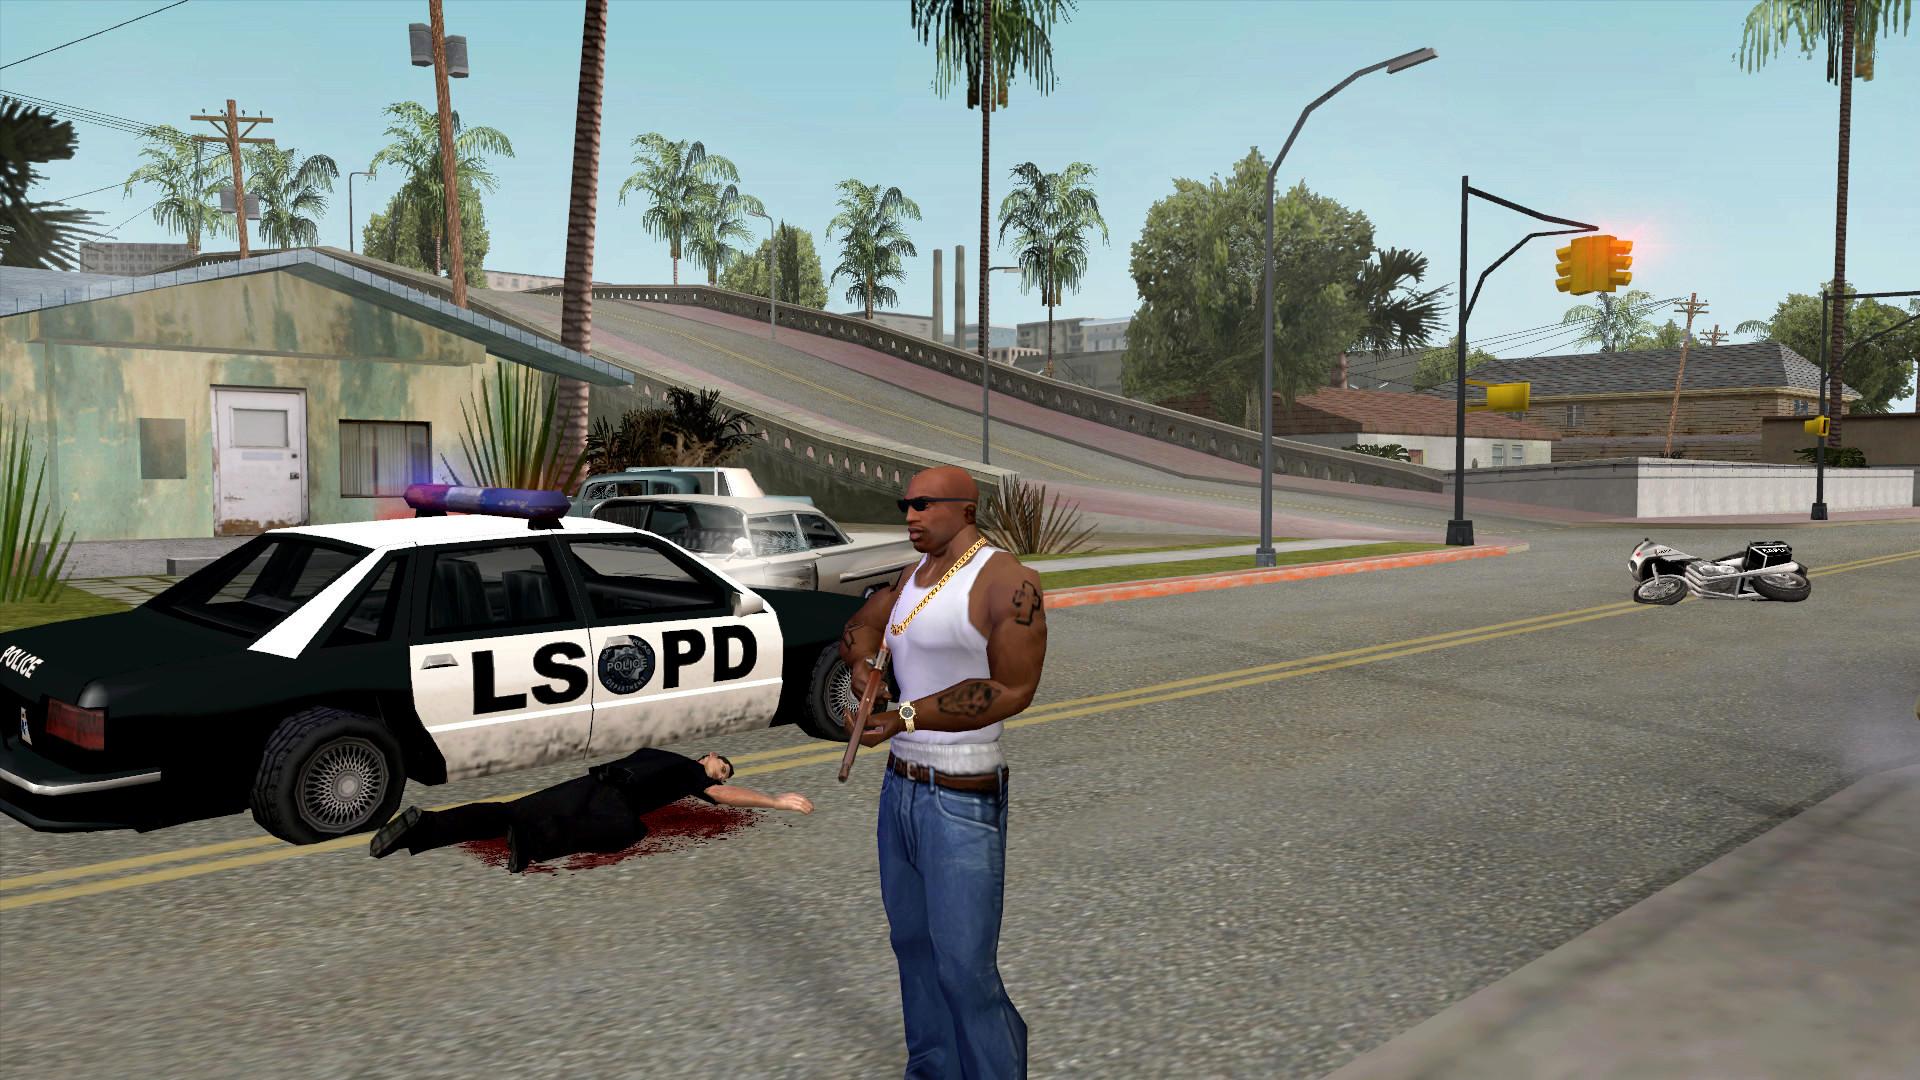 gta_sa 2016-05-10 15-38-34-63.jpg - Grand Theft Auto: San Andreas